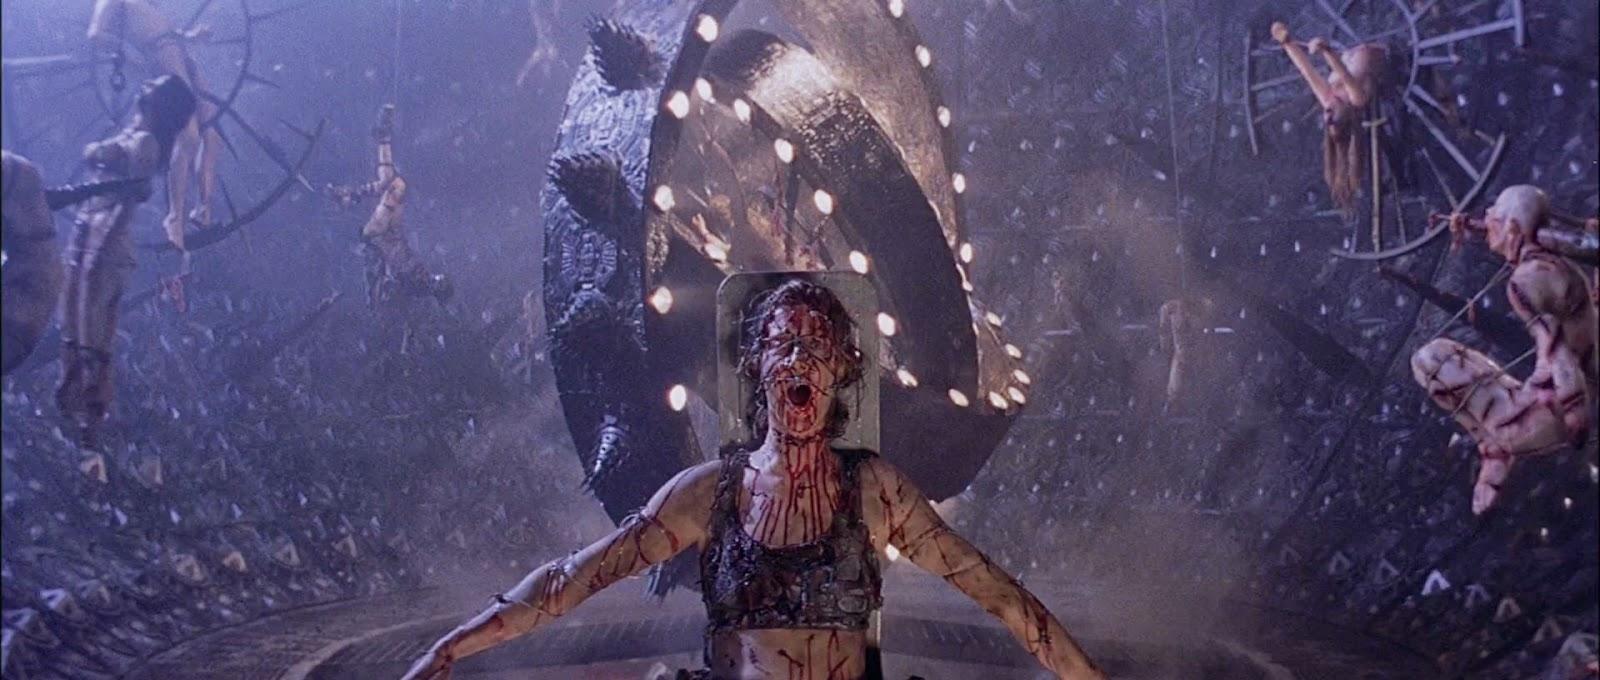 Commentaries on Film: Event Horizon (1997)